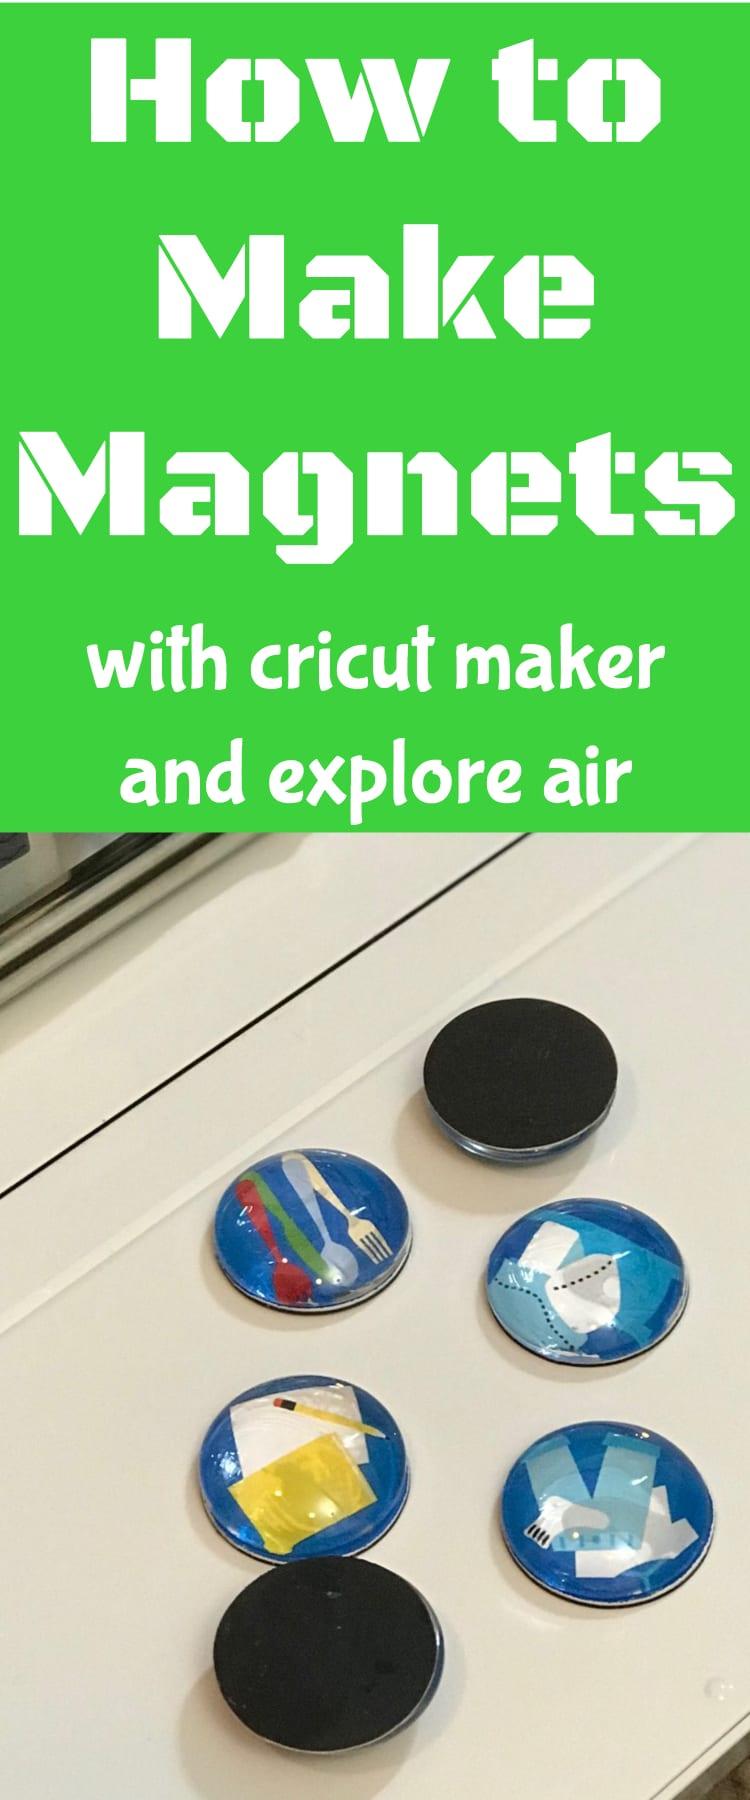 how to make magnets / cricut explore air / cricut maker / diy project / magnet #cricut #cricutmaker #cricutprojects  via @clarkscondensed